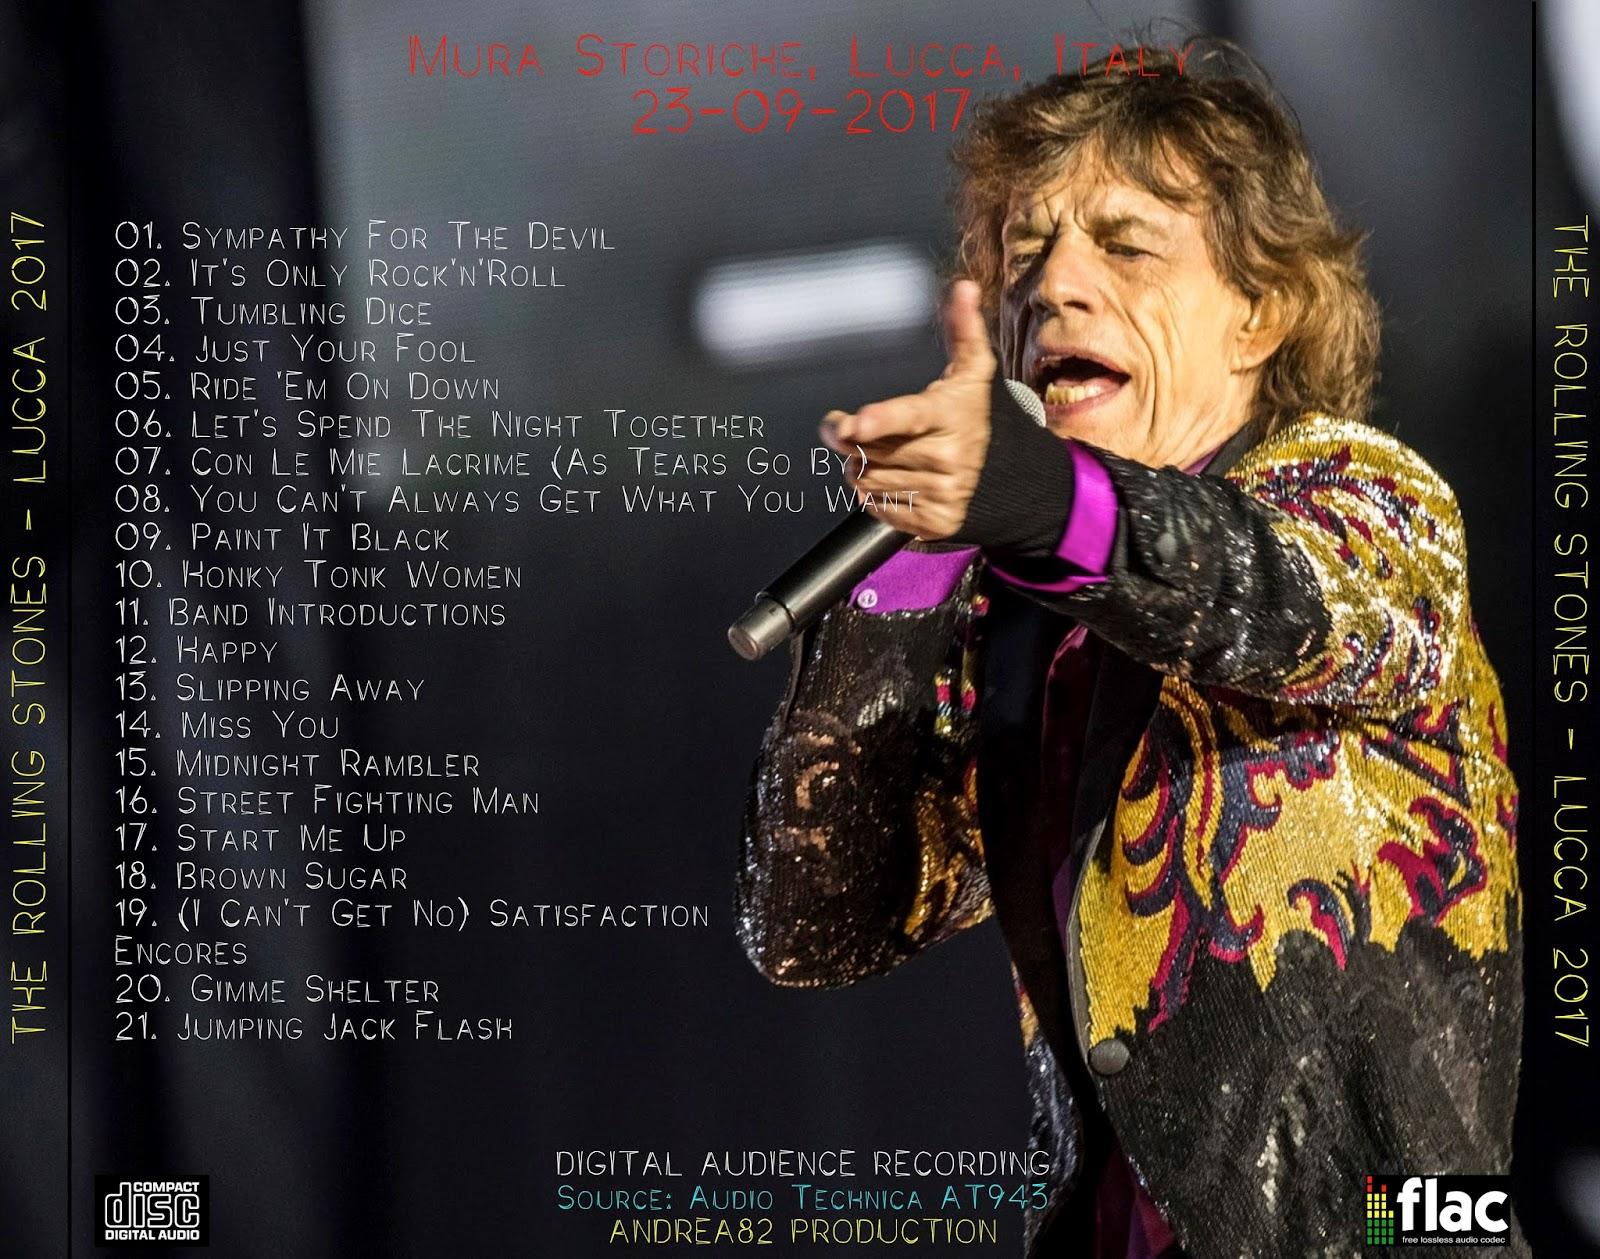 Reliquary: Rolling Stones [2017.09.23] Lucca 2017 ...